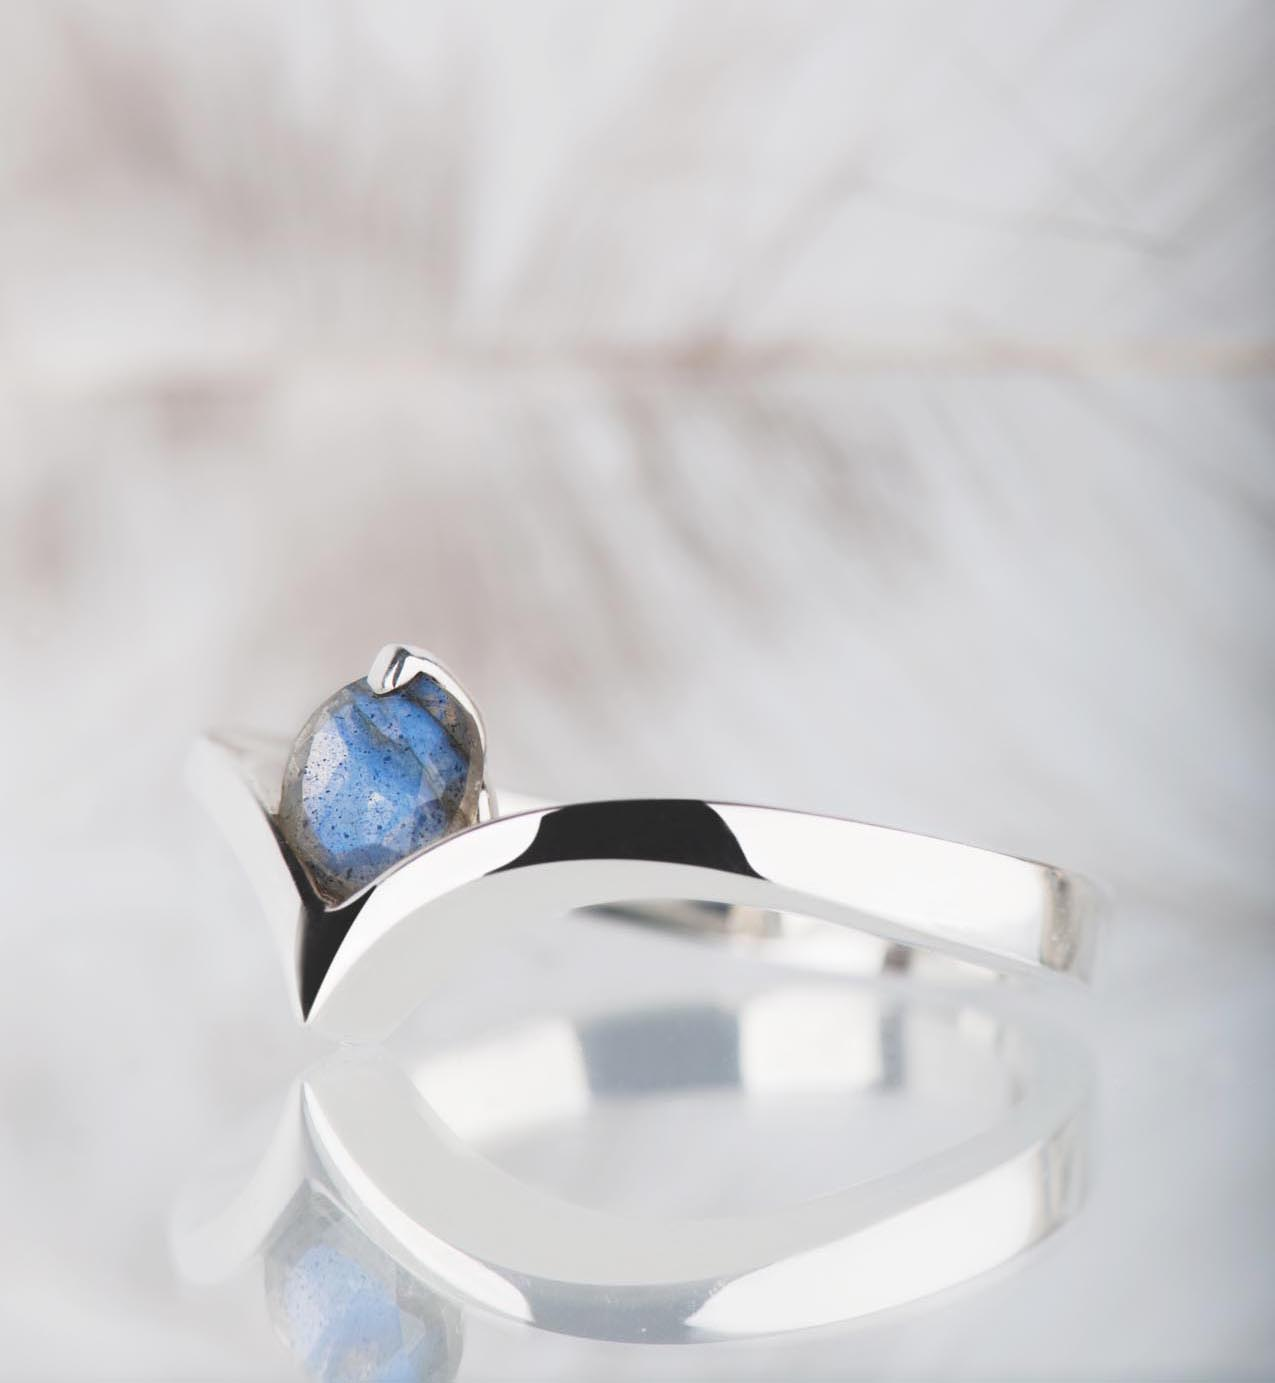 pierścionek zlabradorytem